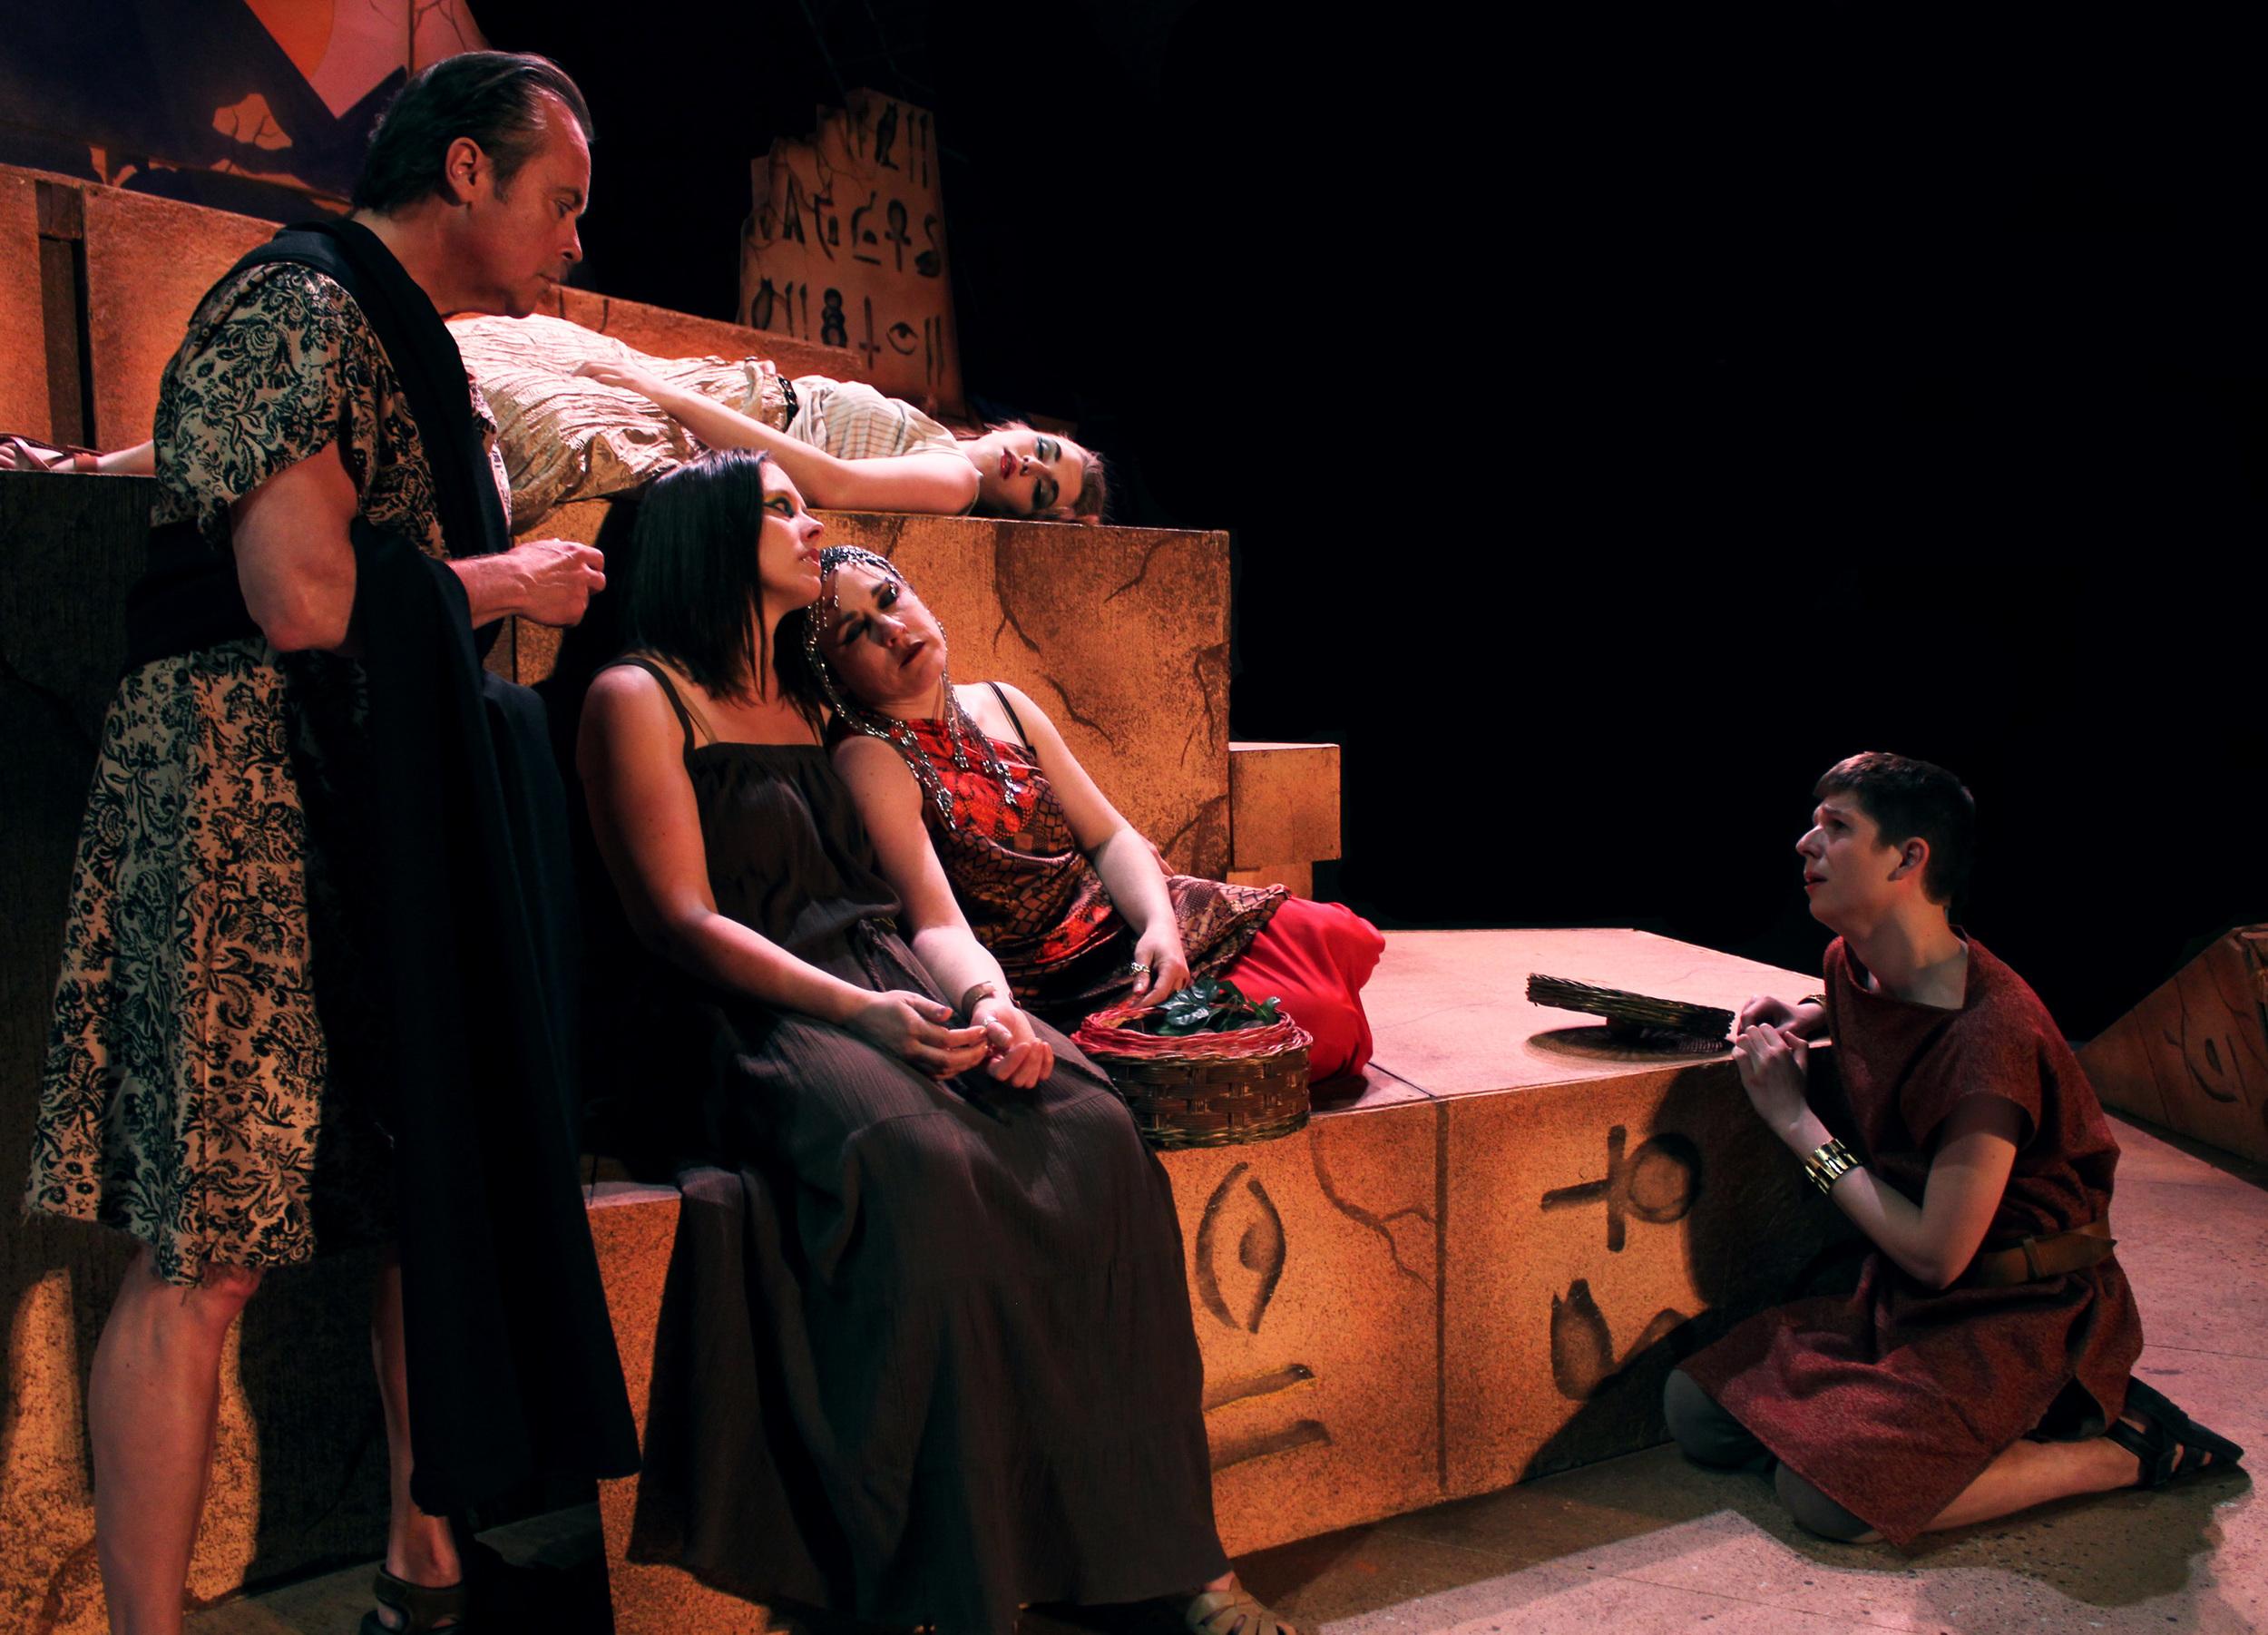 Menas (Jeffrey Rensch), Iras (Miranda Zerbe), Chairmian (Tara Herweg-Mann), Cleopatra (Francesca Amendolia), Thidias (Aiden Roth)